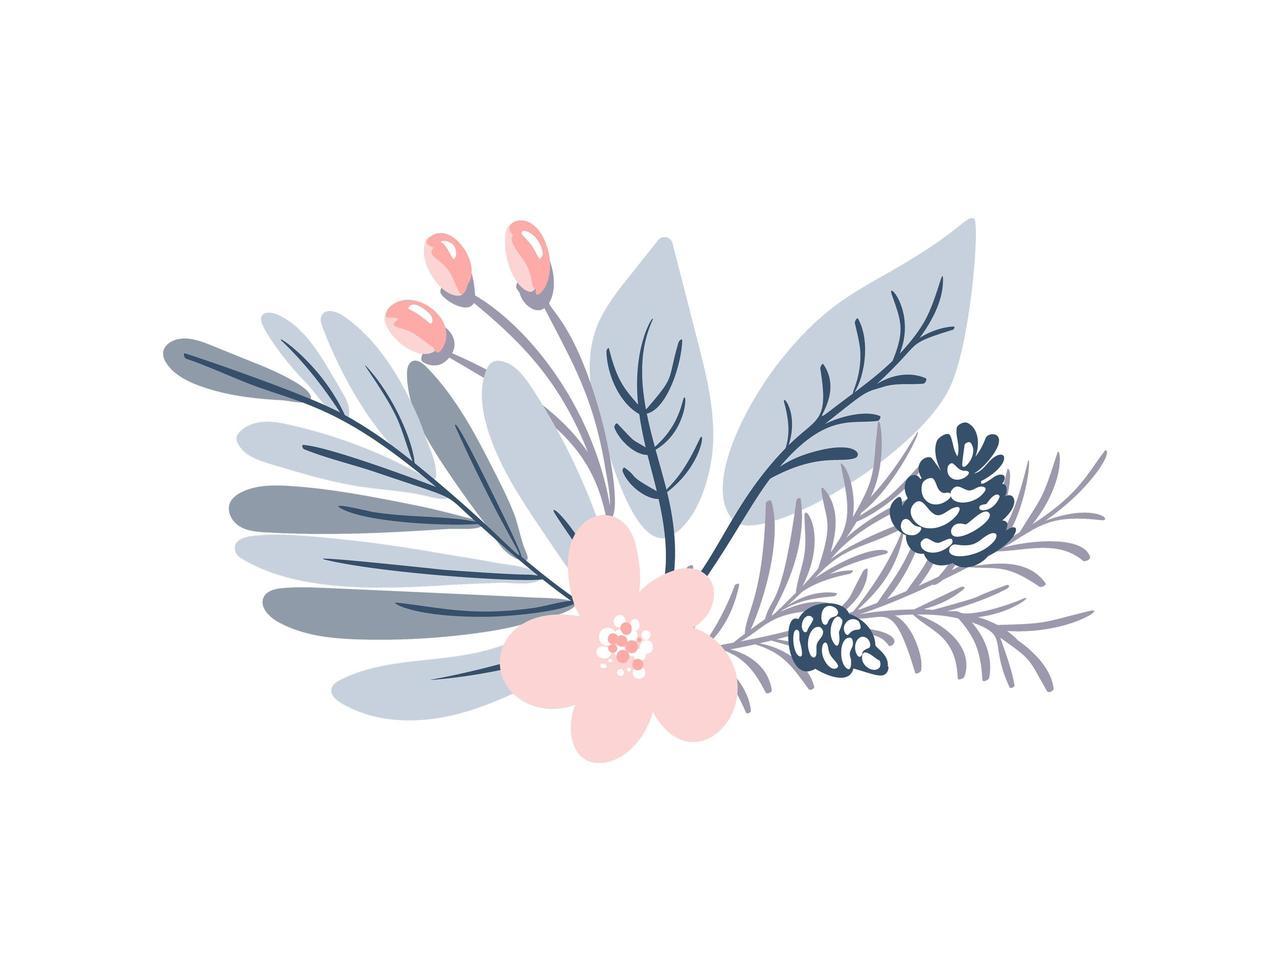 bouquet invernale pastello vettore